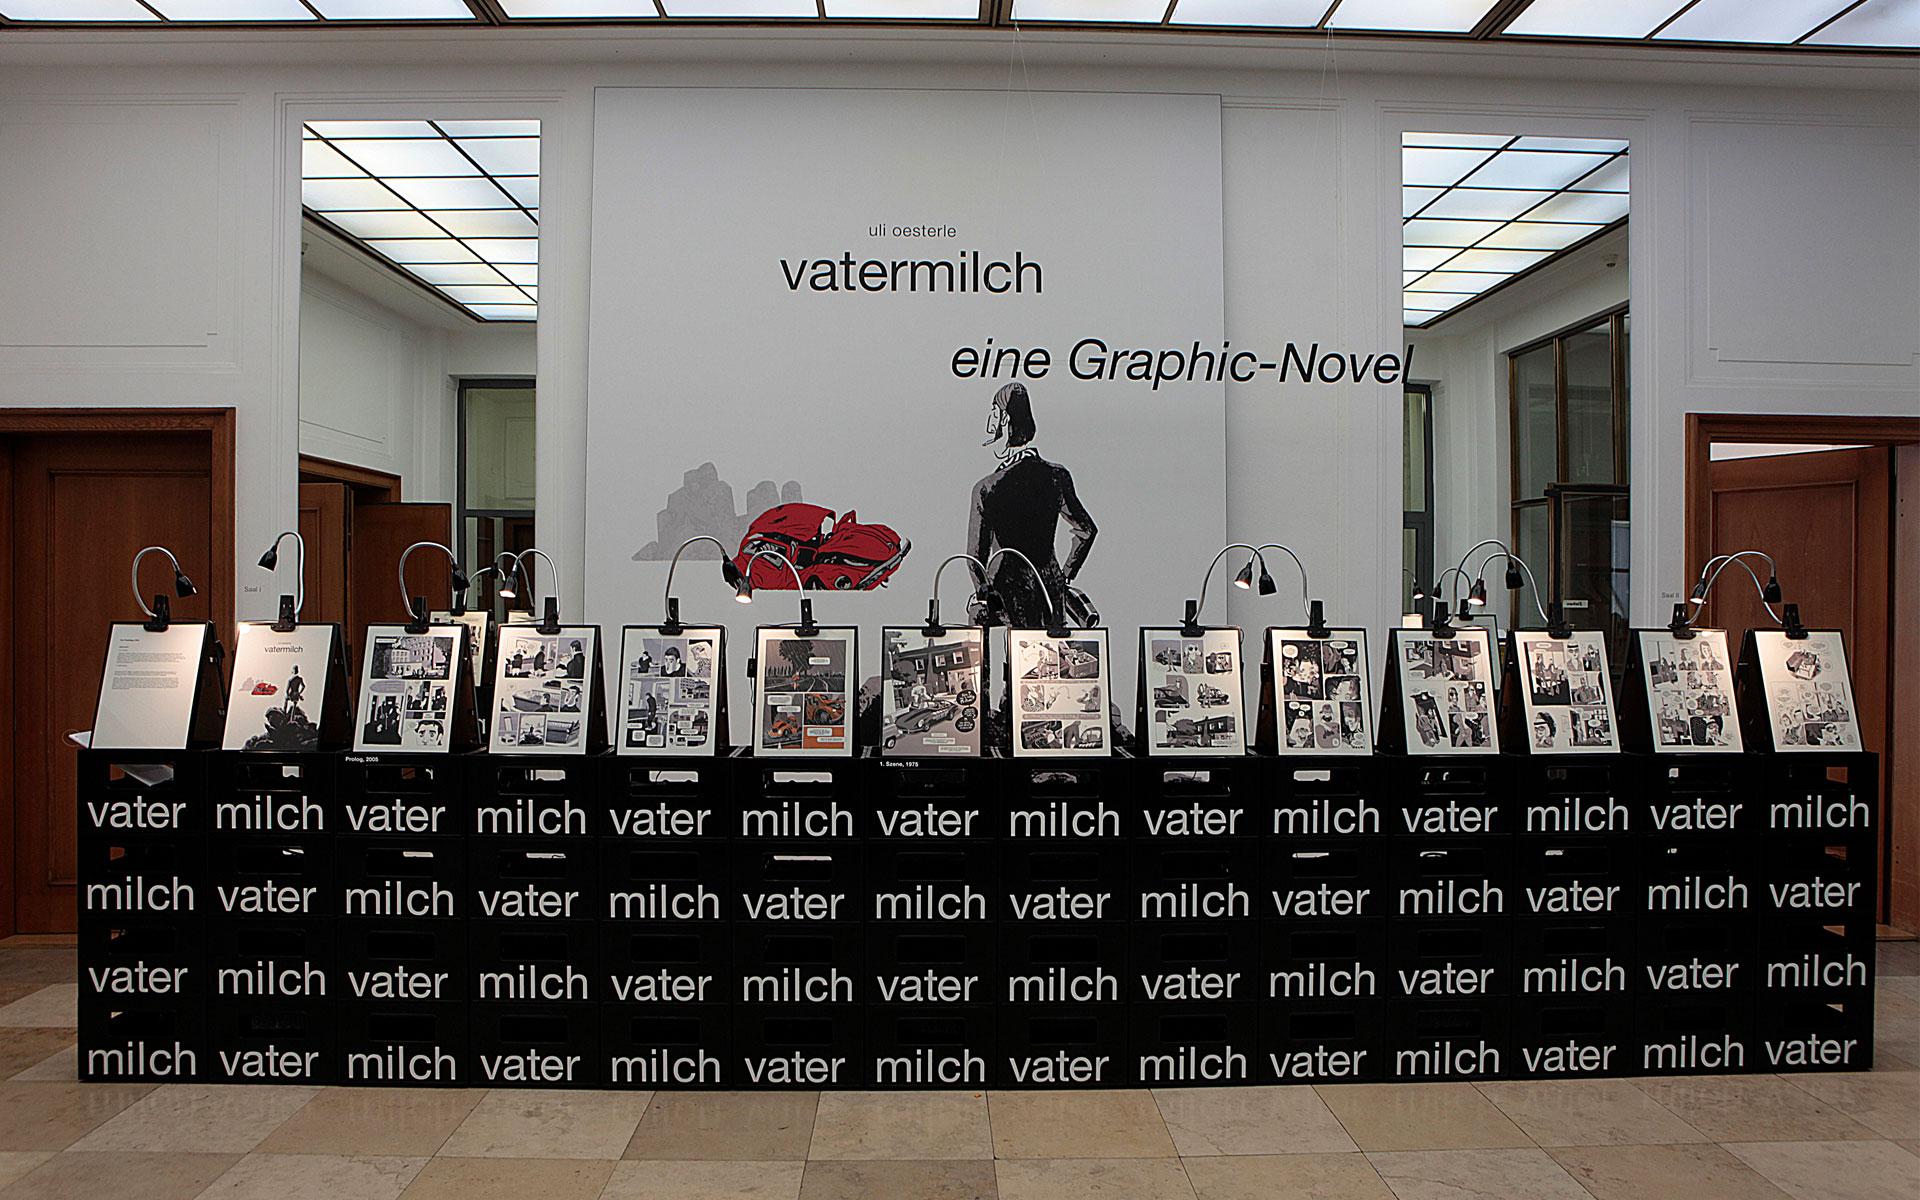 Uli Oesterle: Vatermilch,                                                                                                                                              Dienstag, 26.04.16                      -                          Donnerstag, 19.05.16                                                                               <br/>(c) Berthold-Leibinger-Stiftung